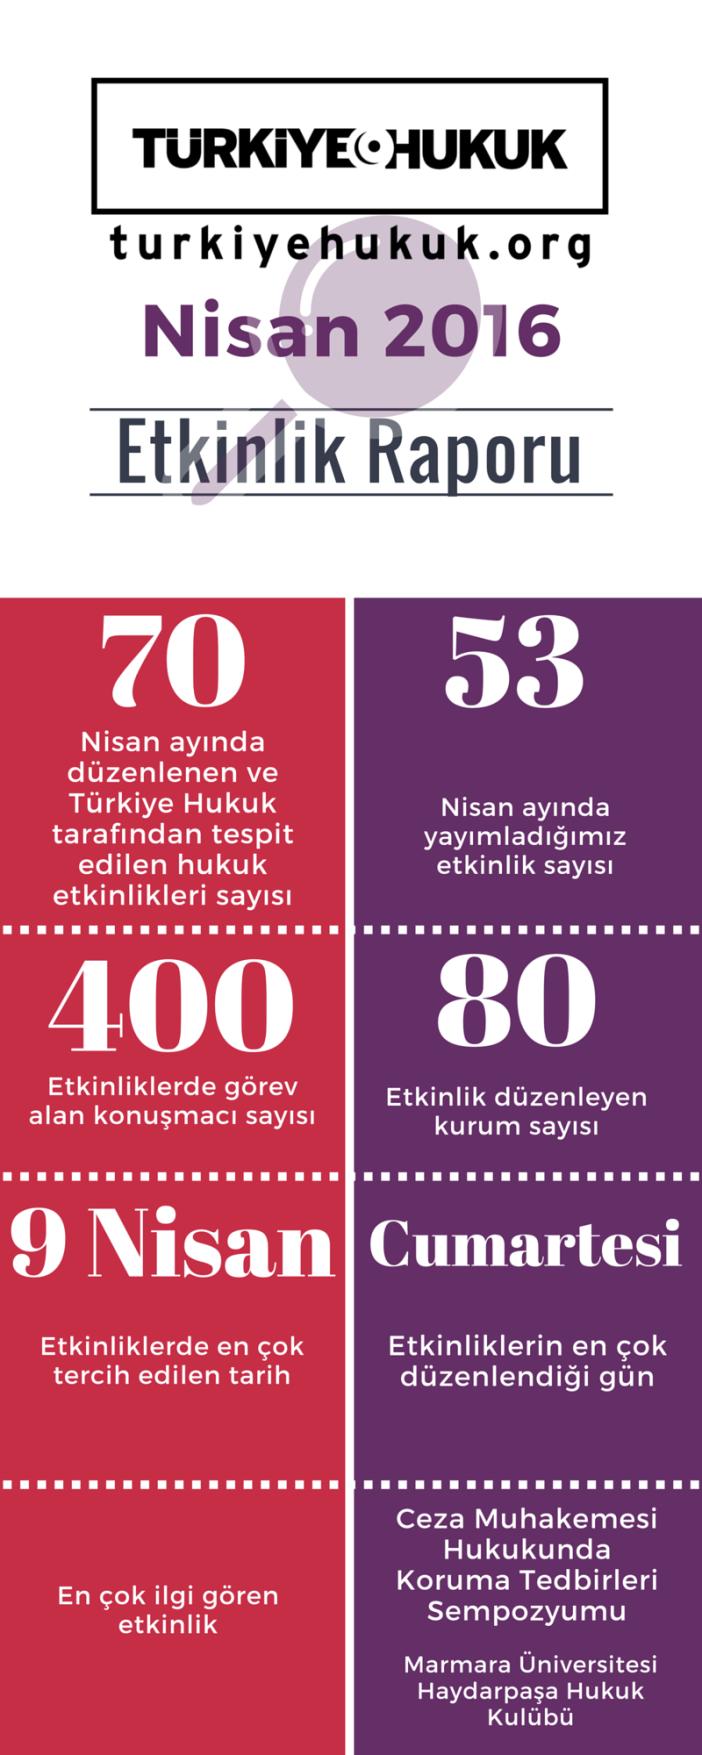 hukuk_etkinlikleri_raporu